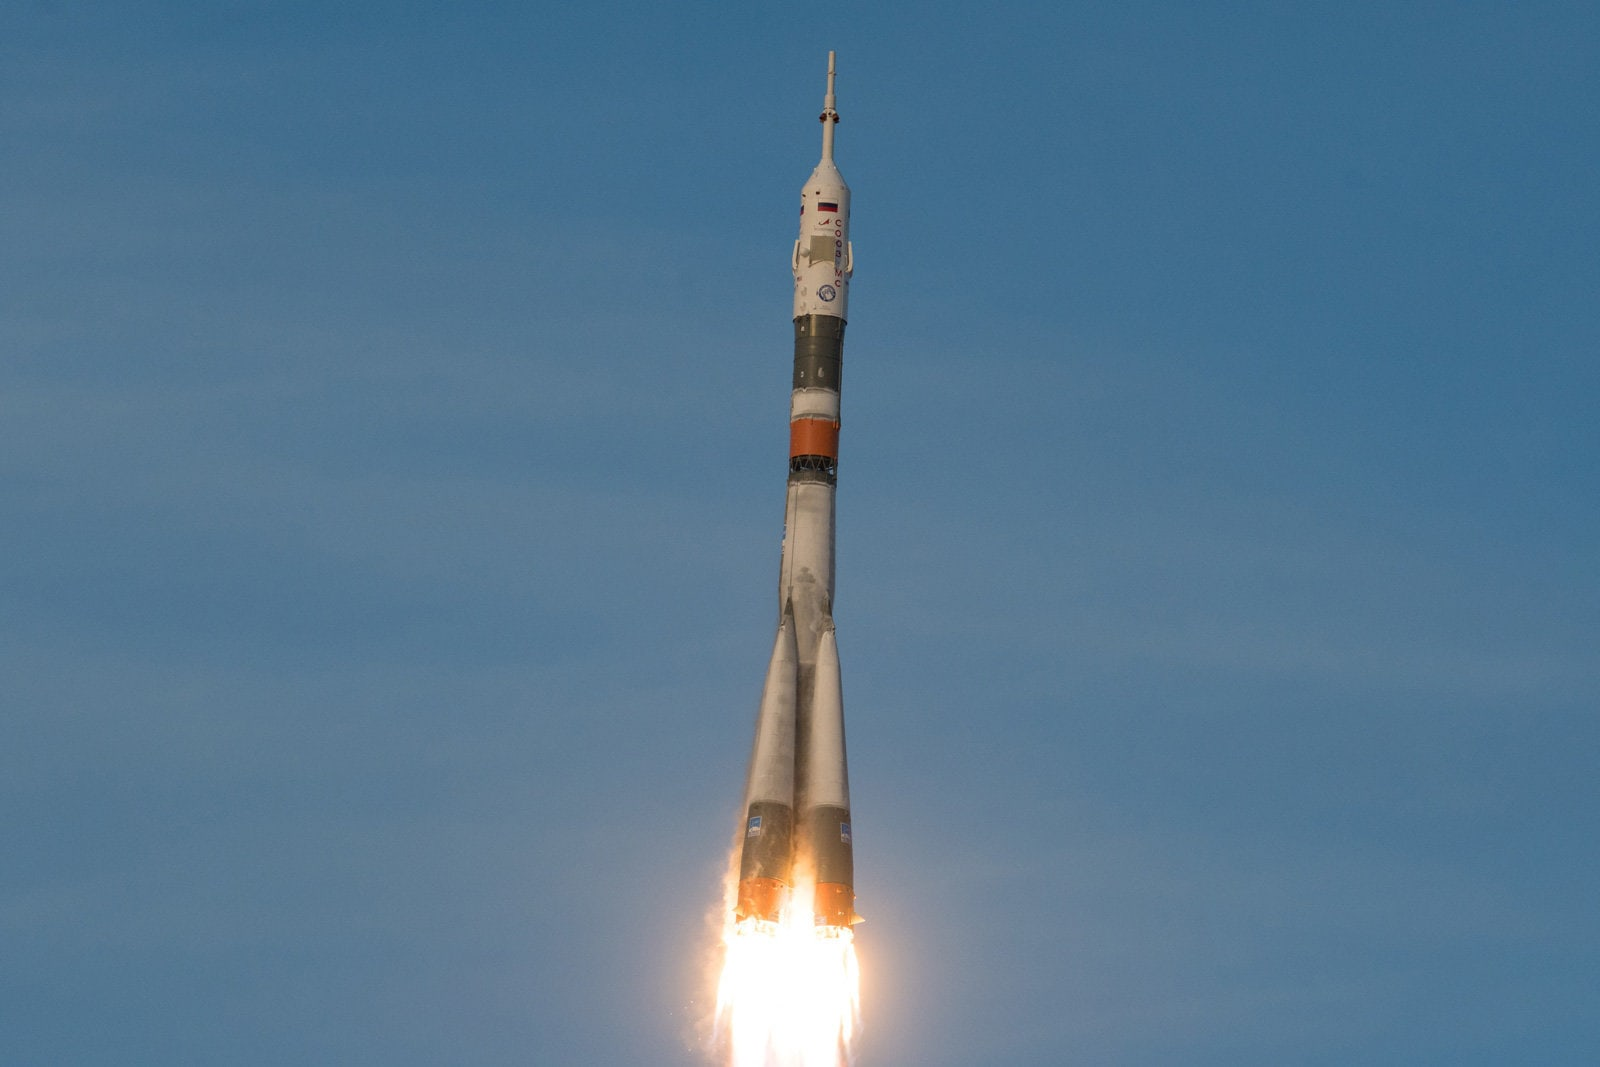 NASA / Aubrey Gemignani、Flickr